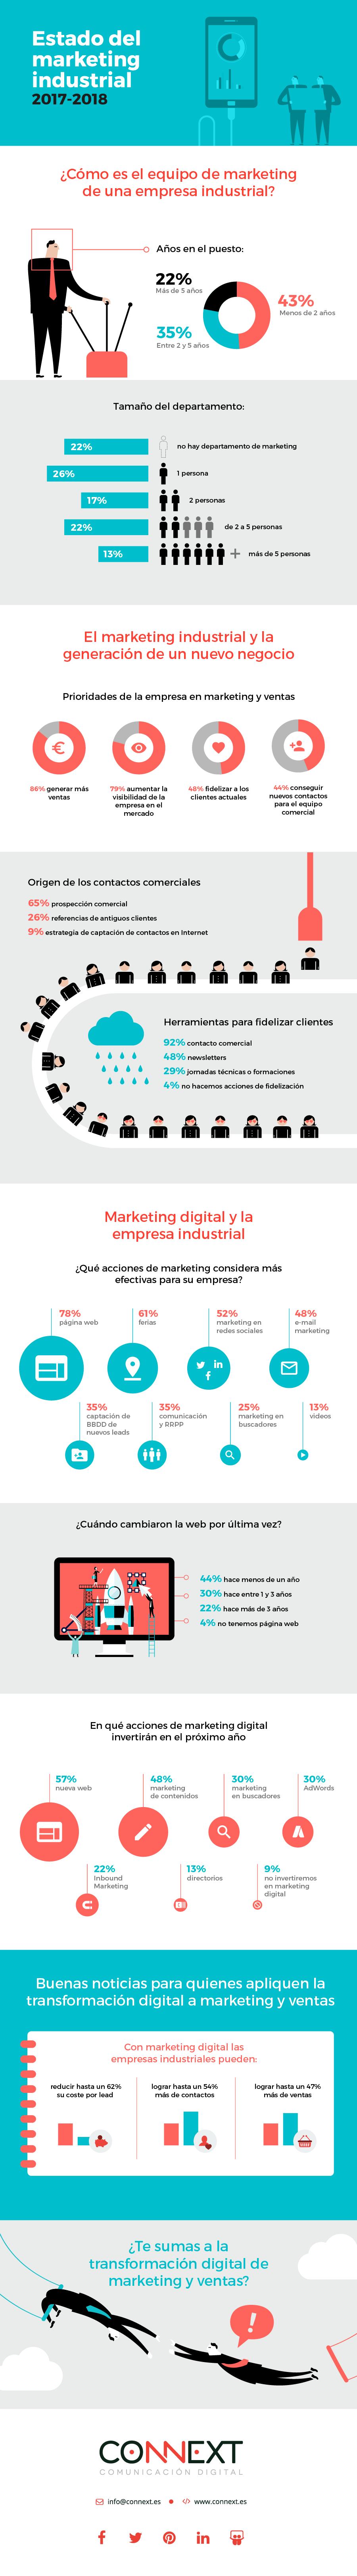 infografia-estado-marketing-industrial